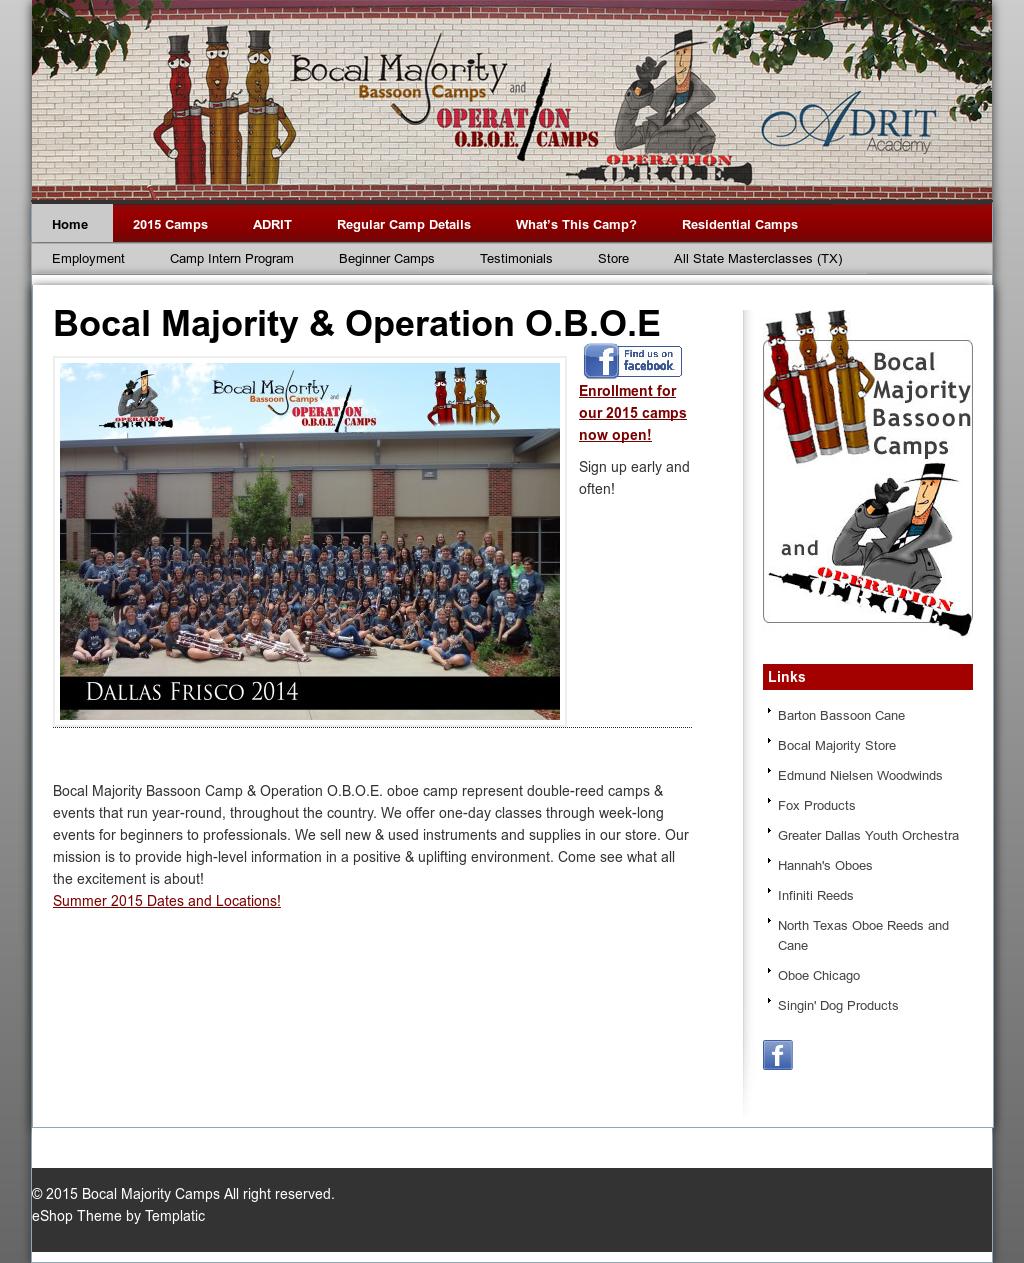 Bocal Majority Bassoon Camp And Operation O b o e